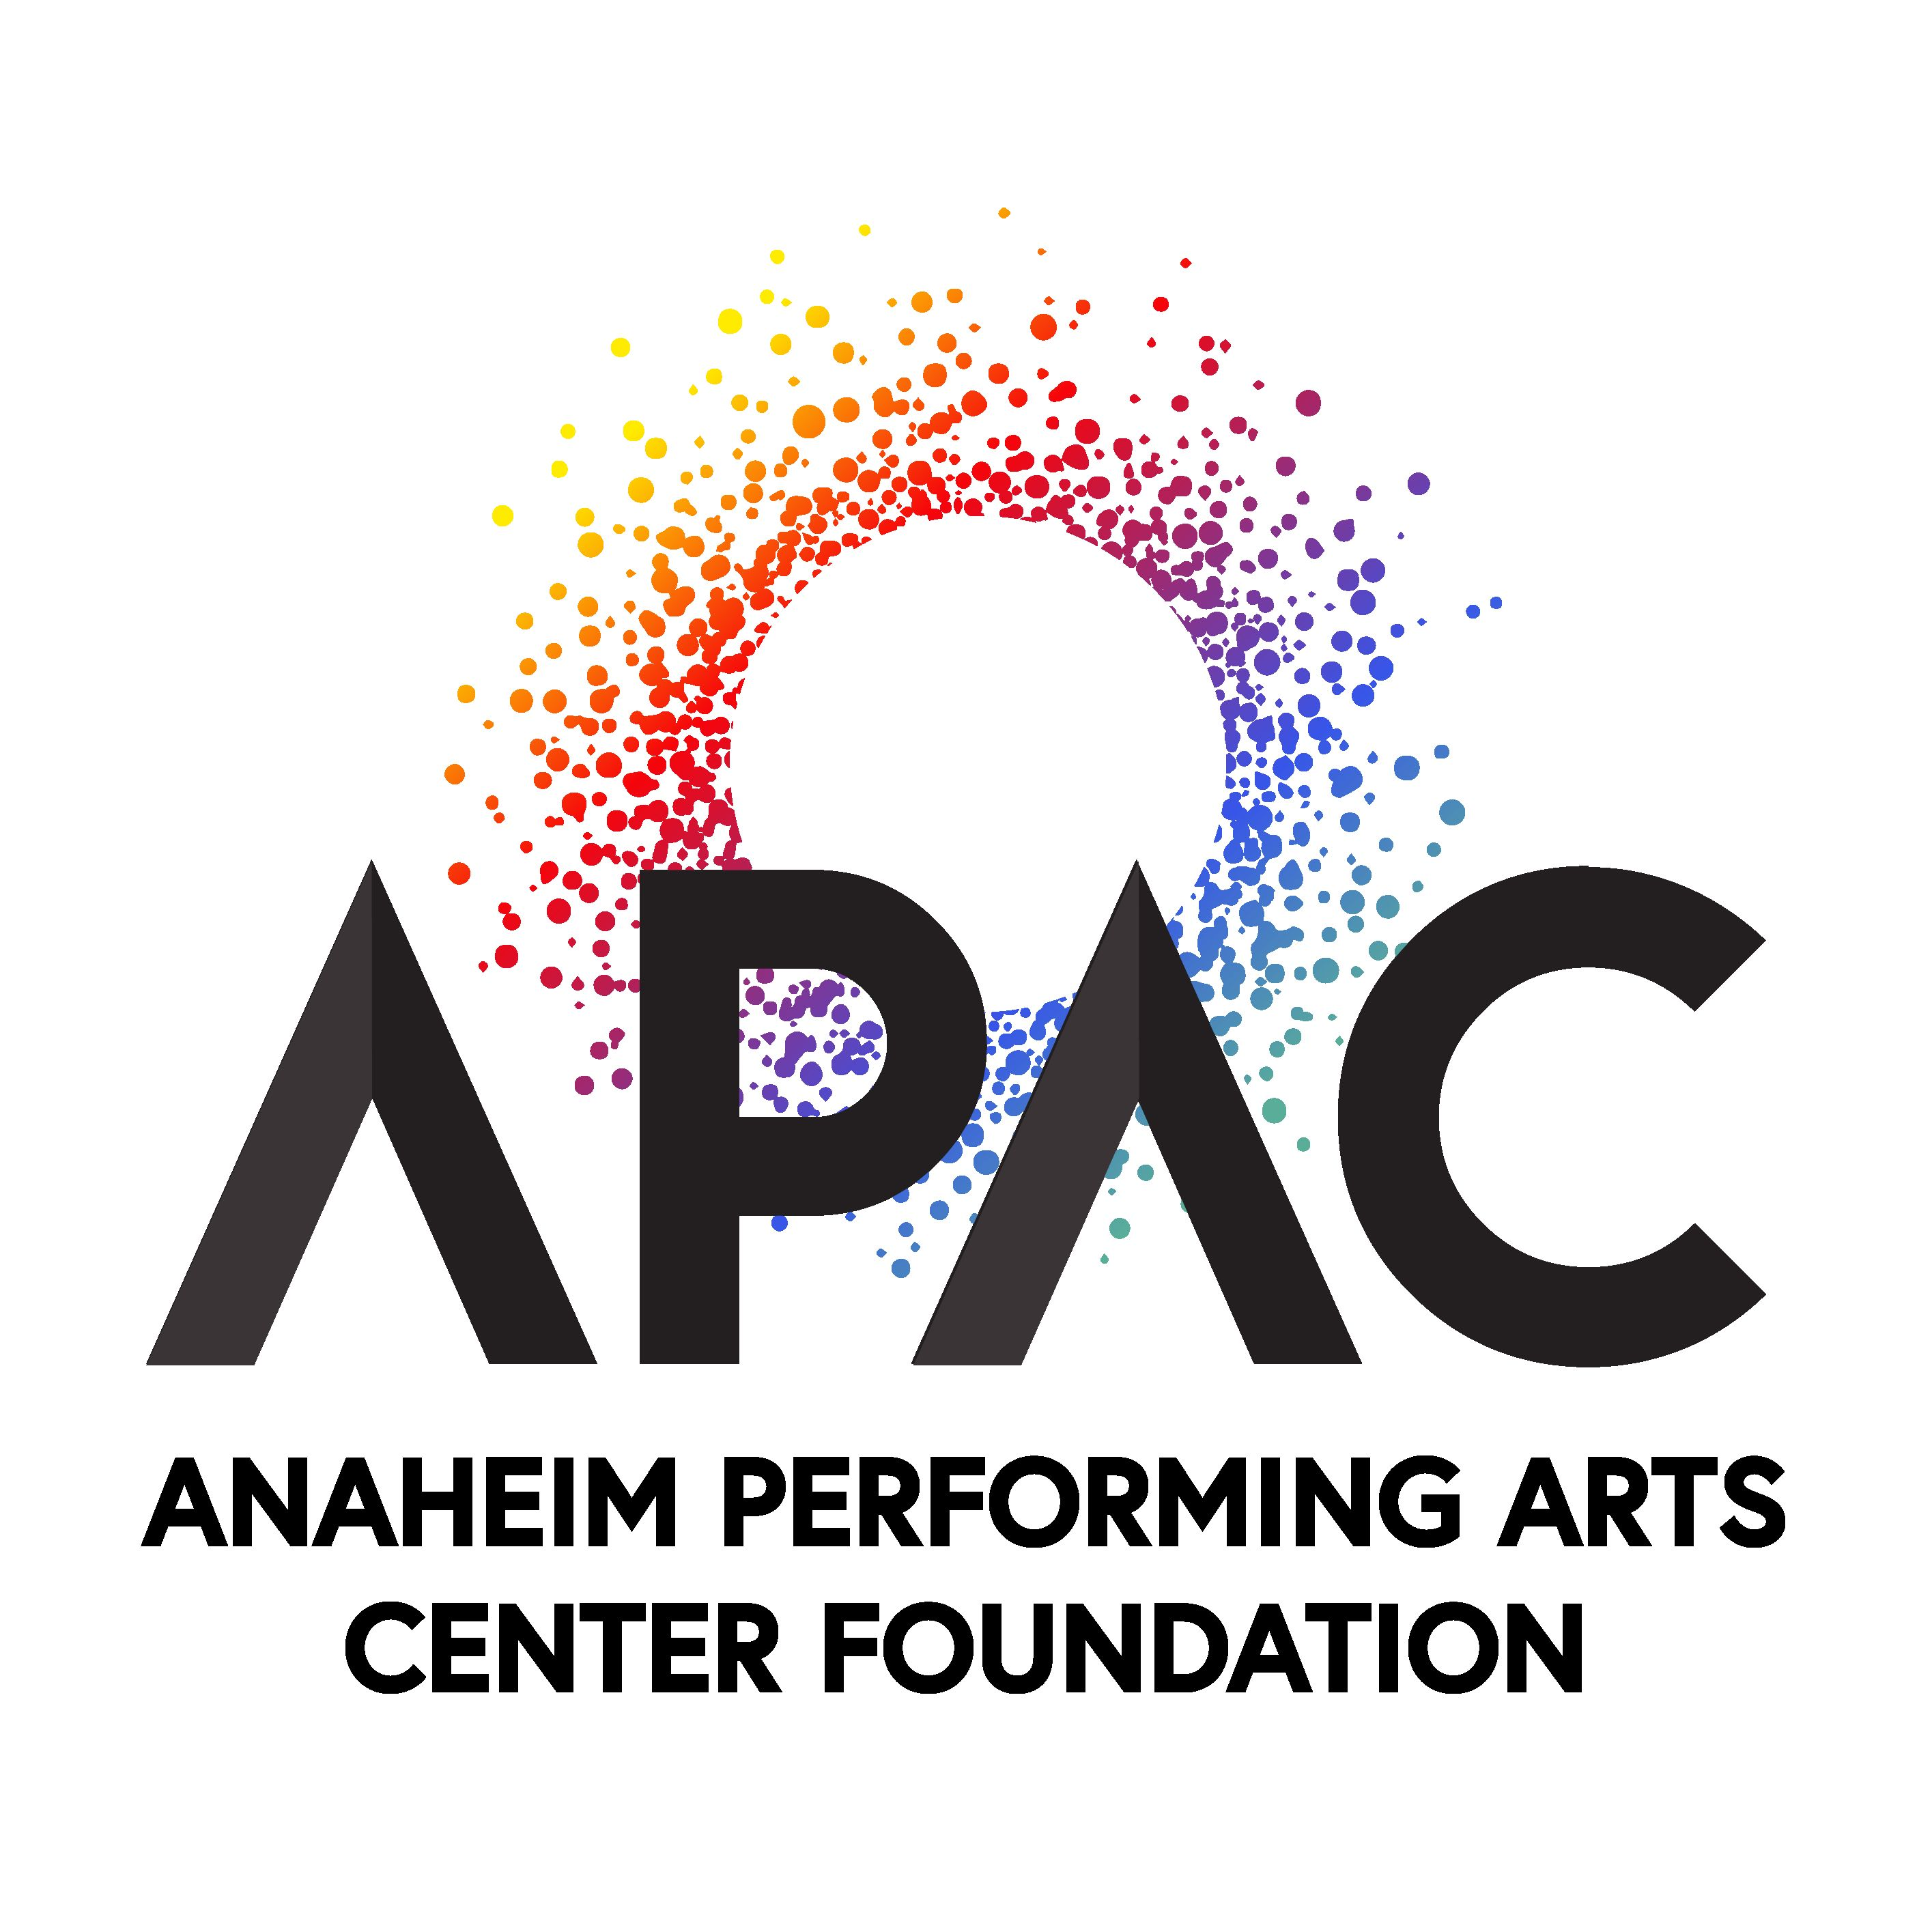 Anaheim Performing Arts Center Foundation